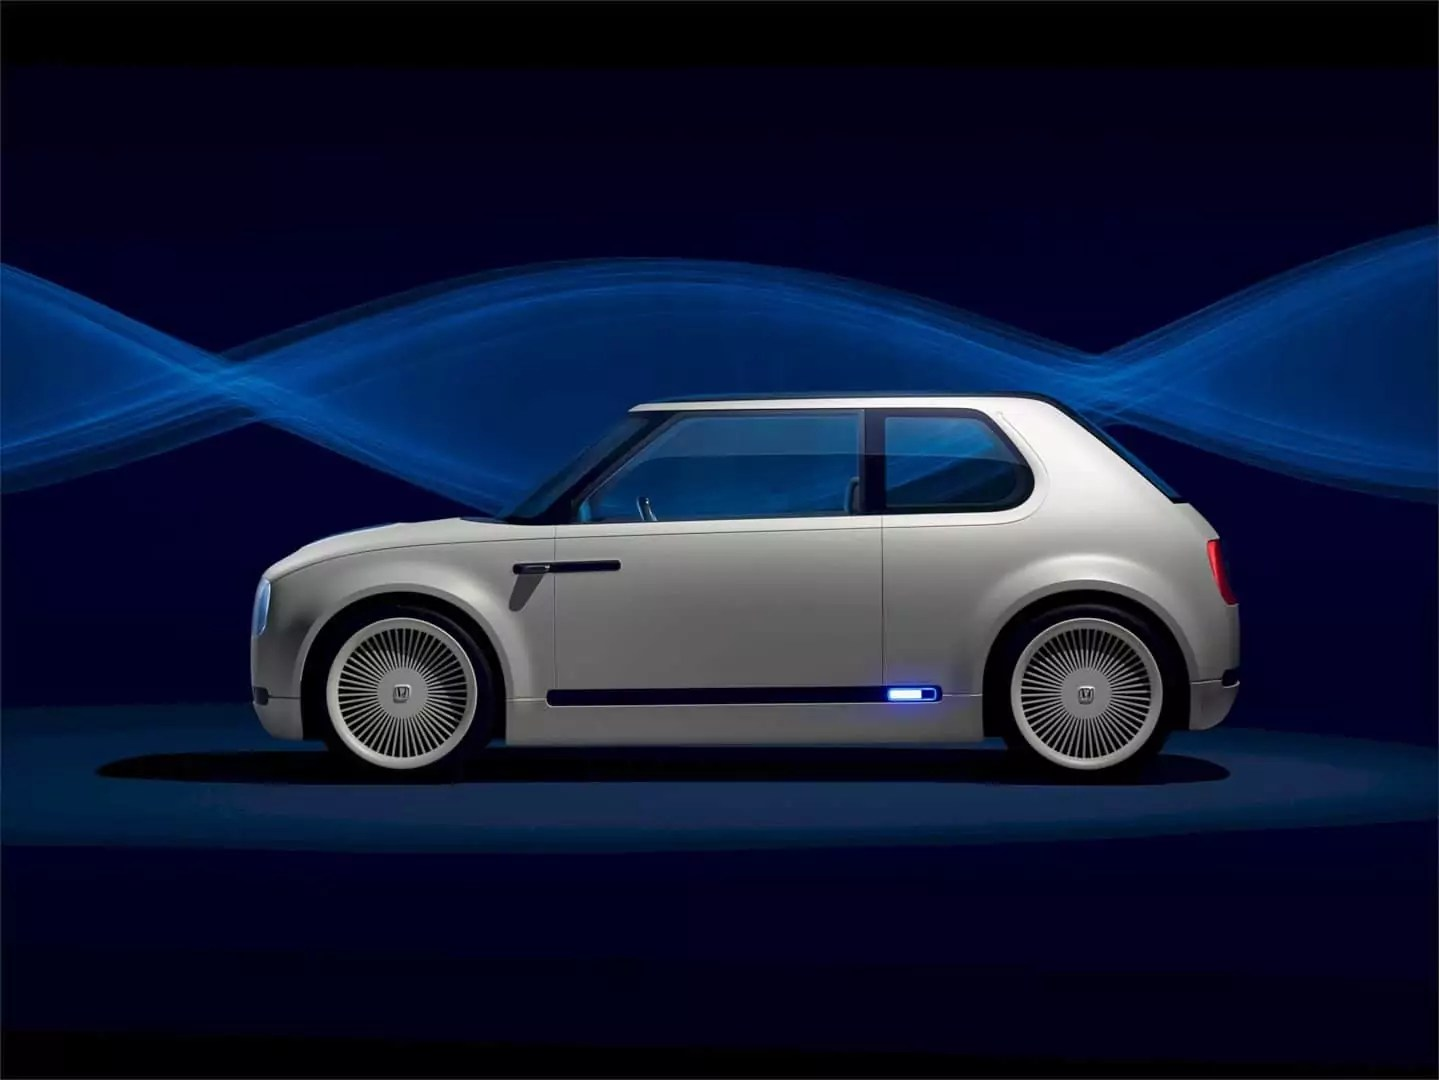 Honda Urban EV Concept: The Best Urban EV on The Market